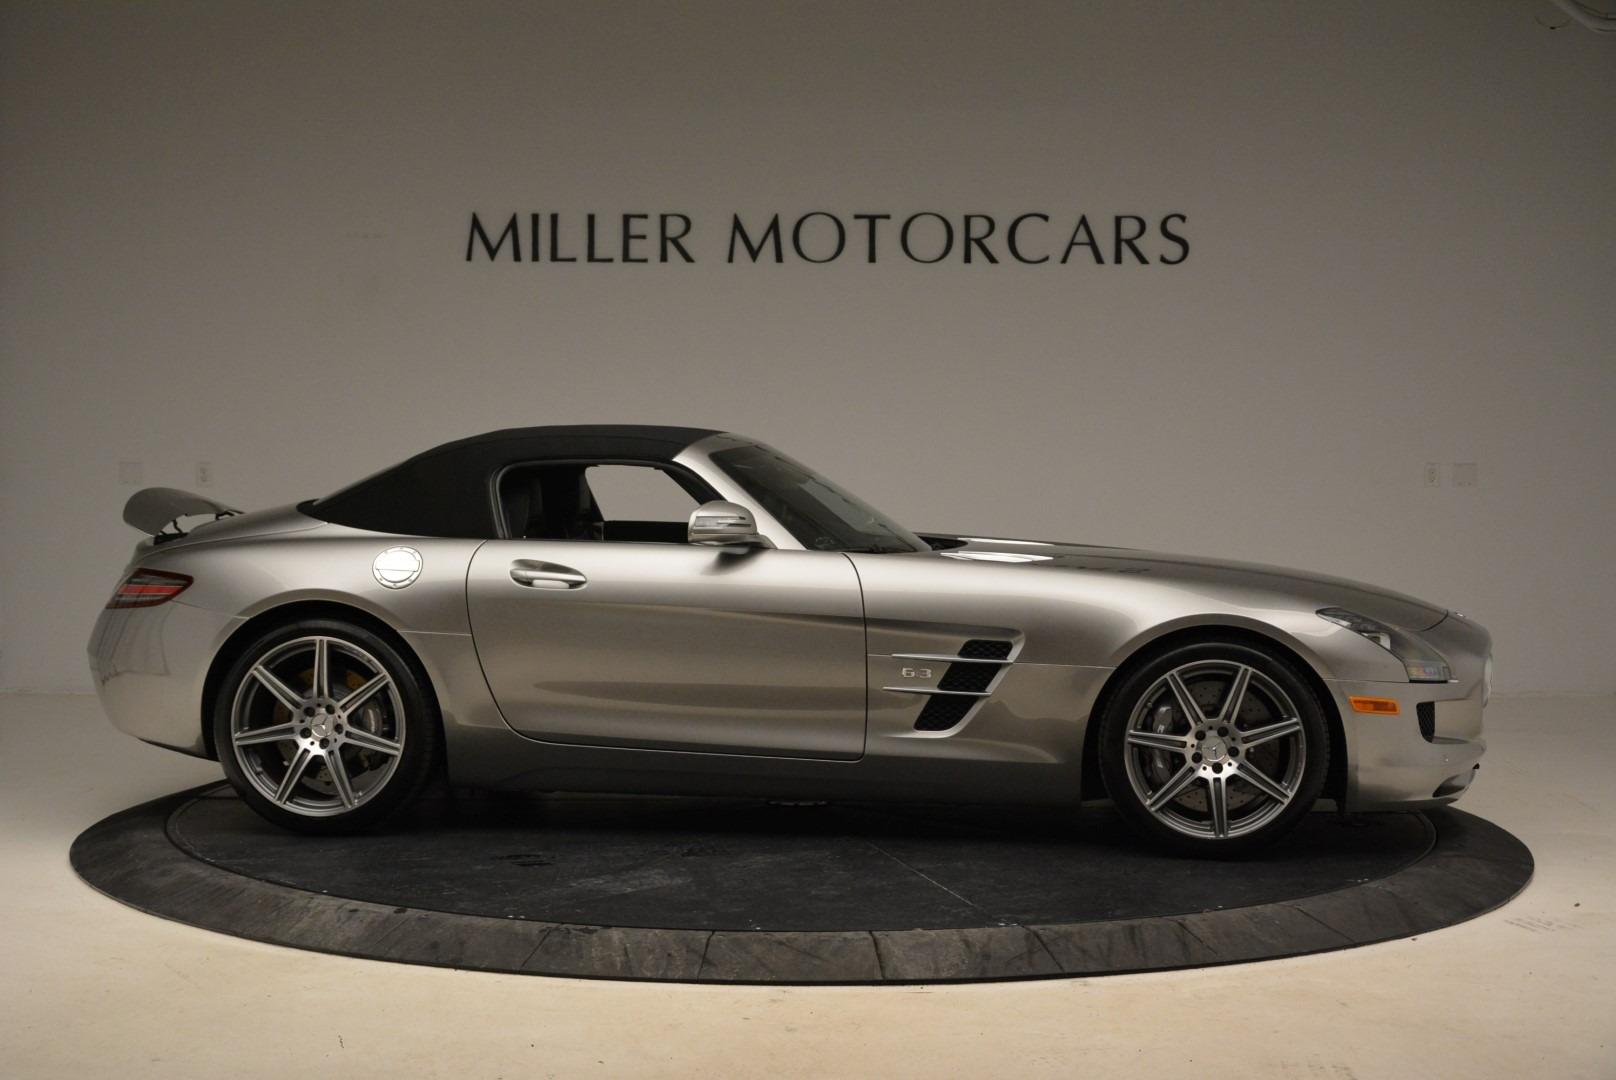 Used 2012 Mercedes-Benz SLS AMG  For Sale In Westport, CT 2068_p18